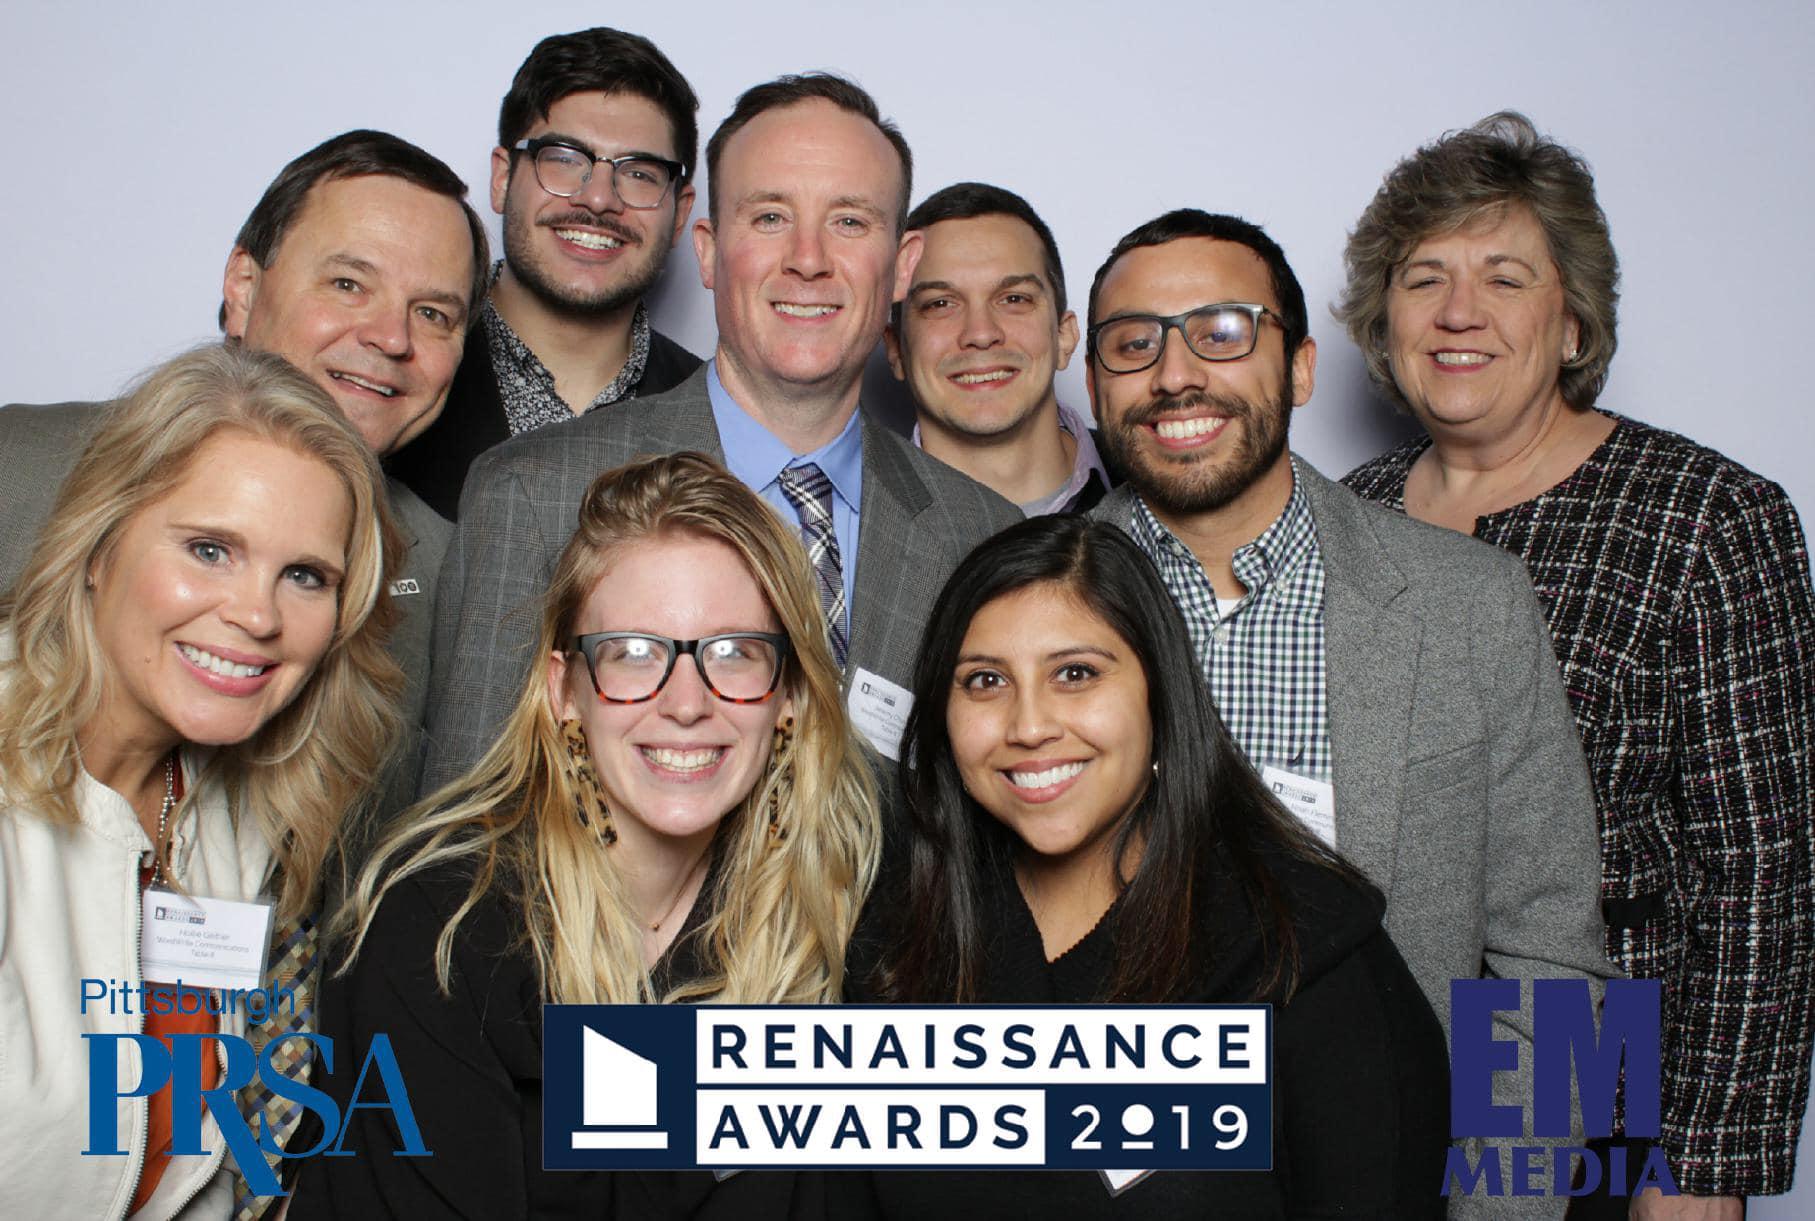 WordWrite staff with 2019 Renaissance Award